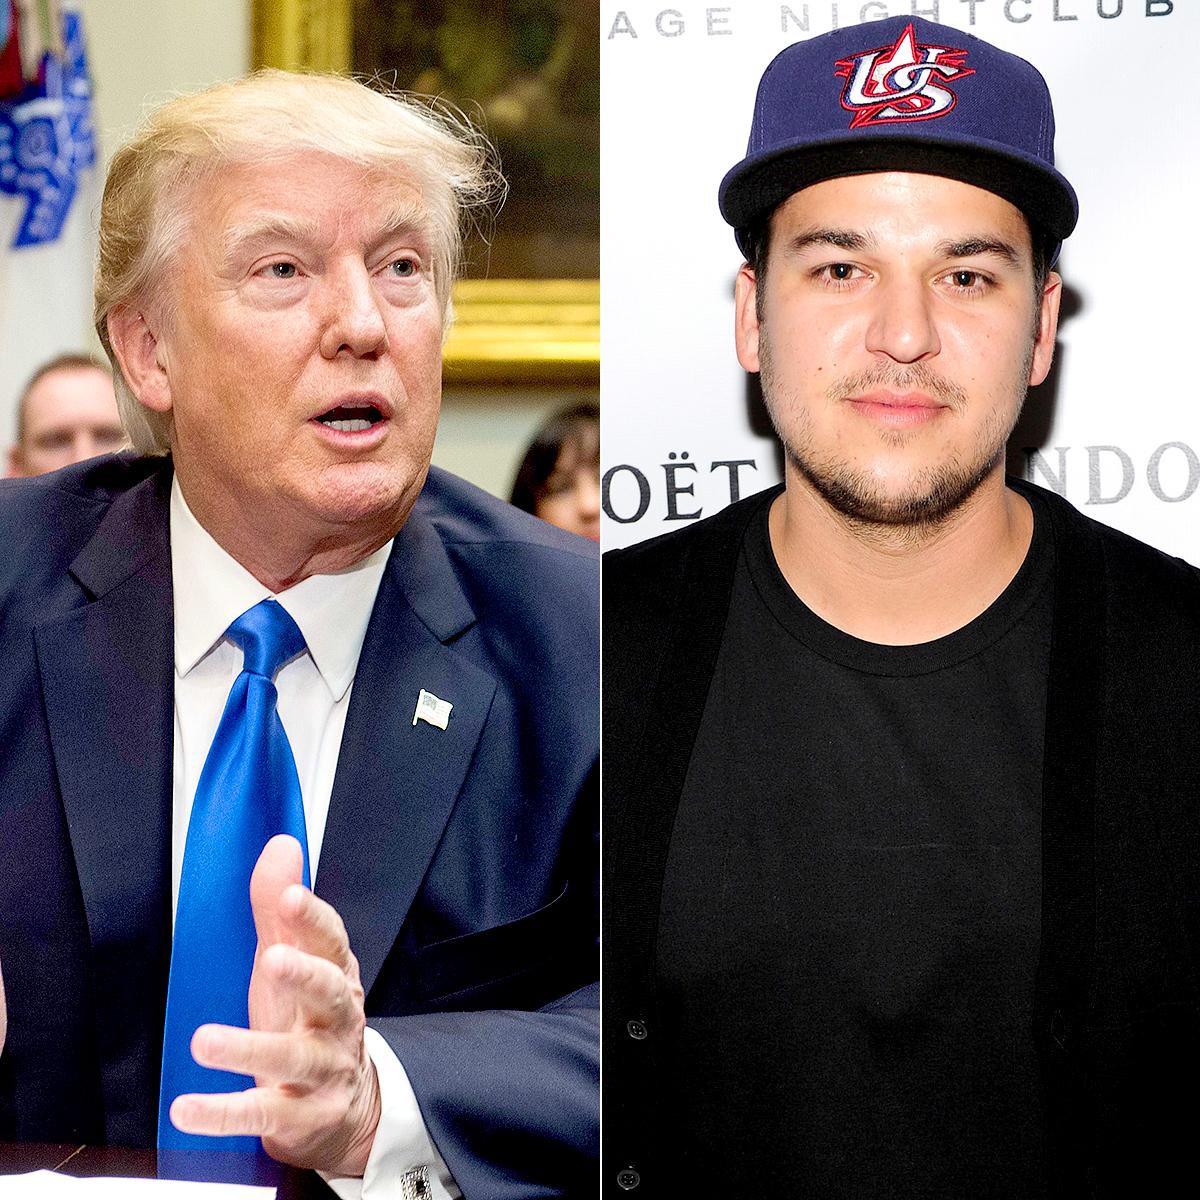 Donald Trump and Rob Kardashian